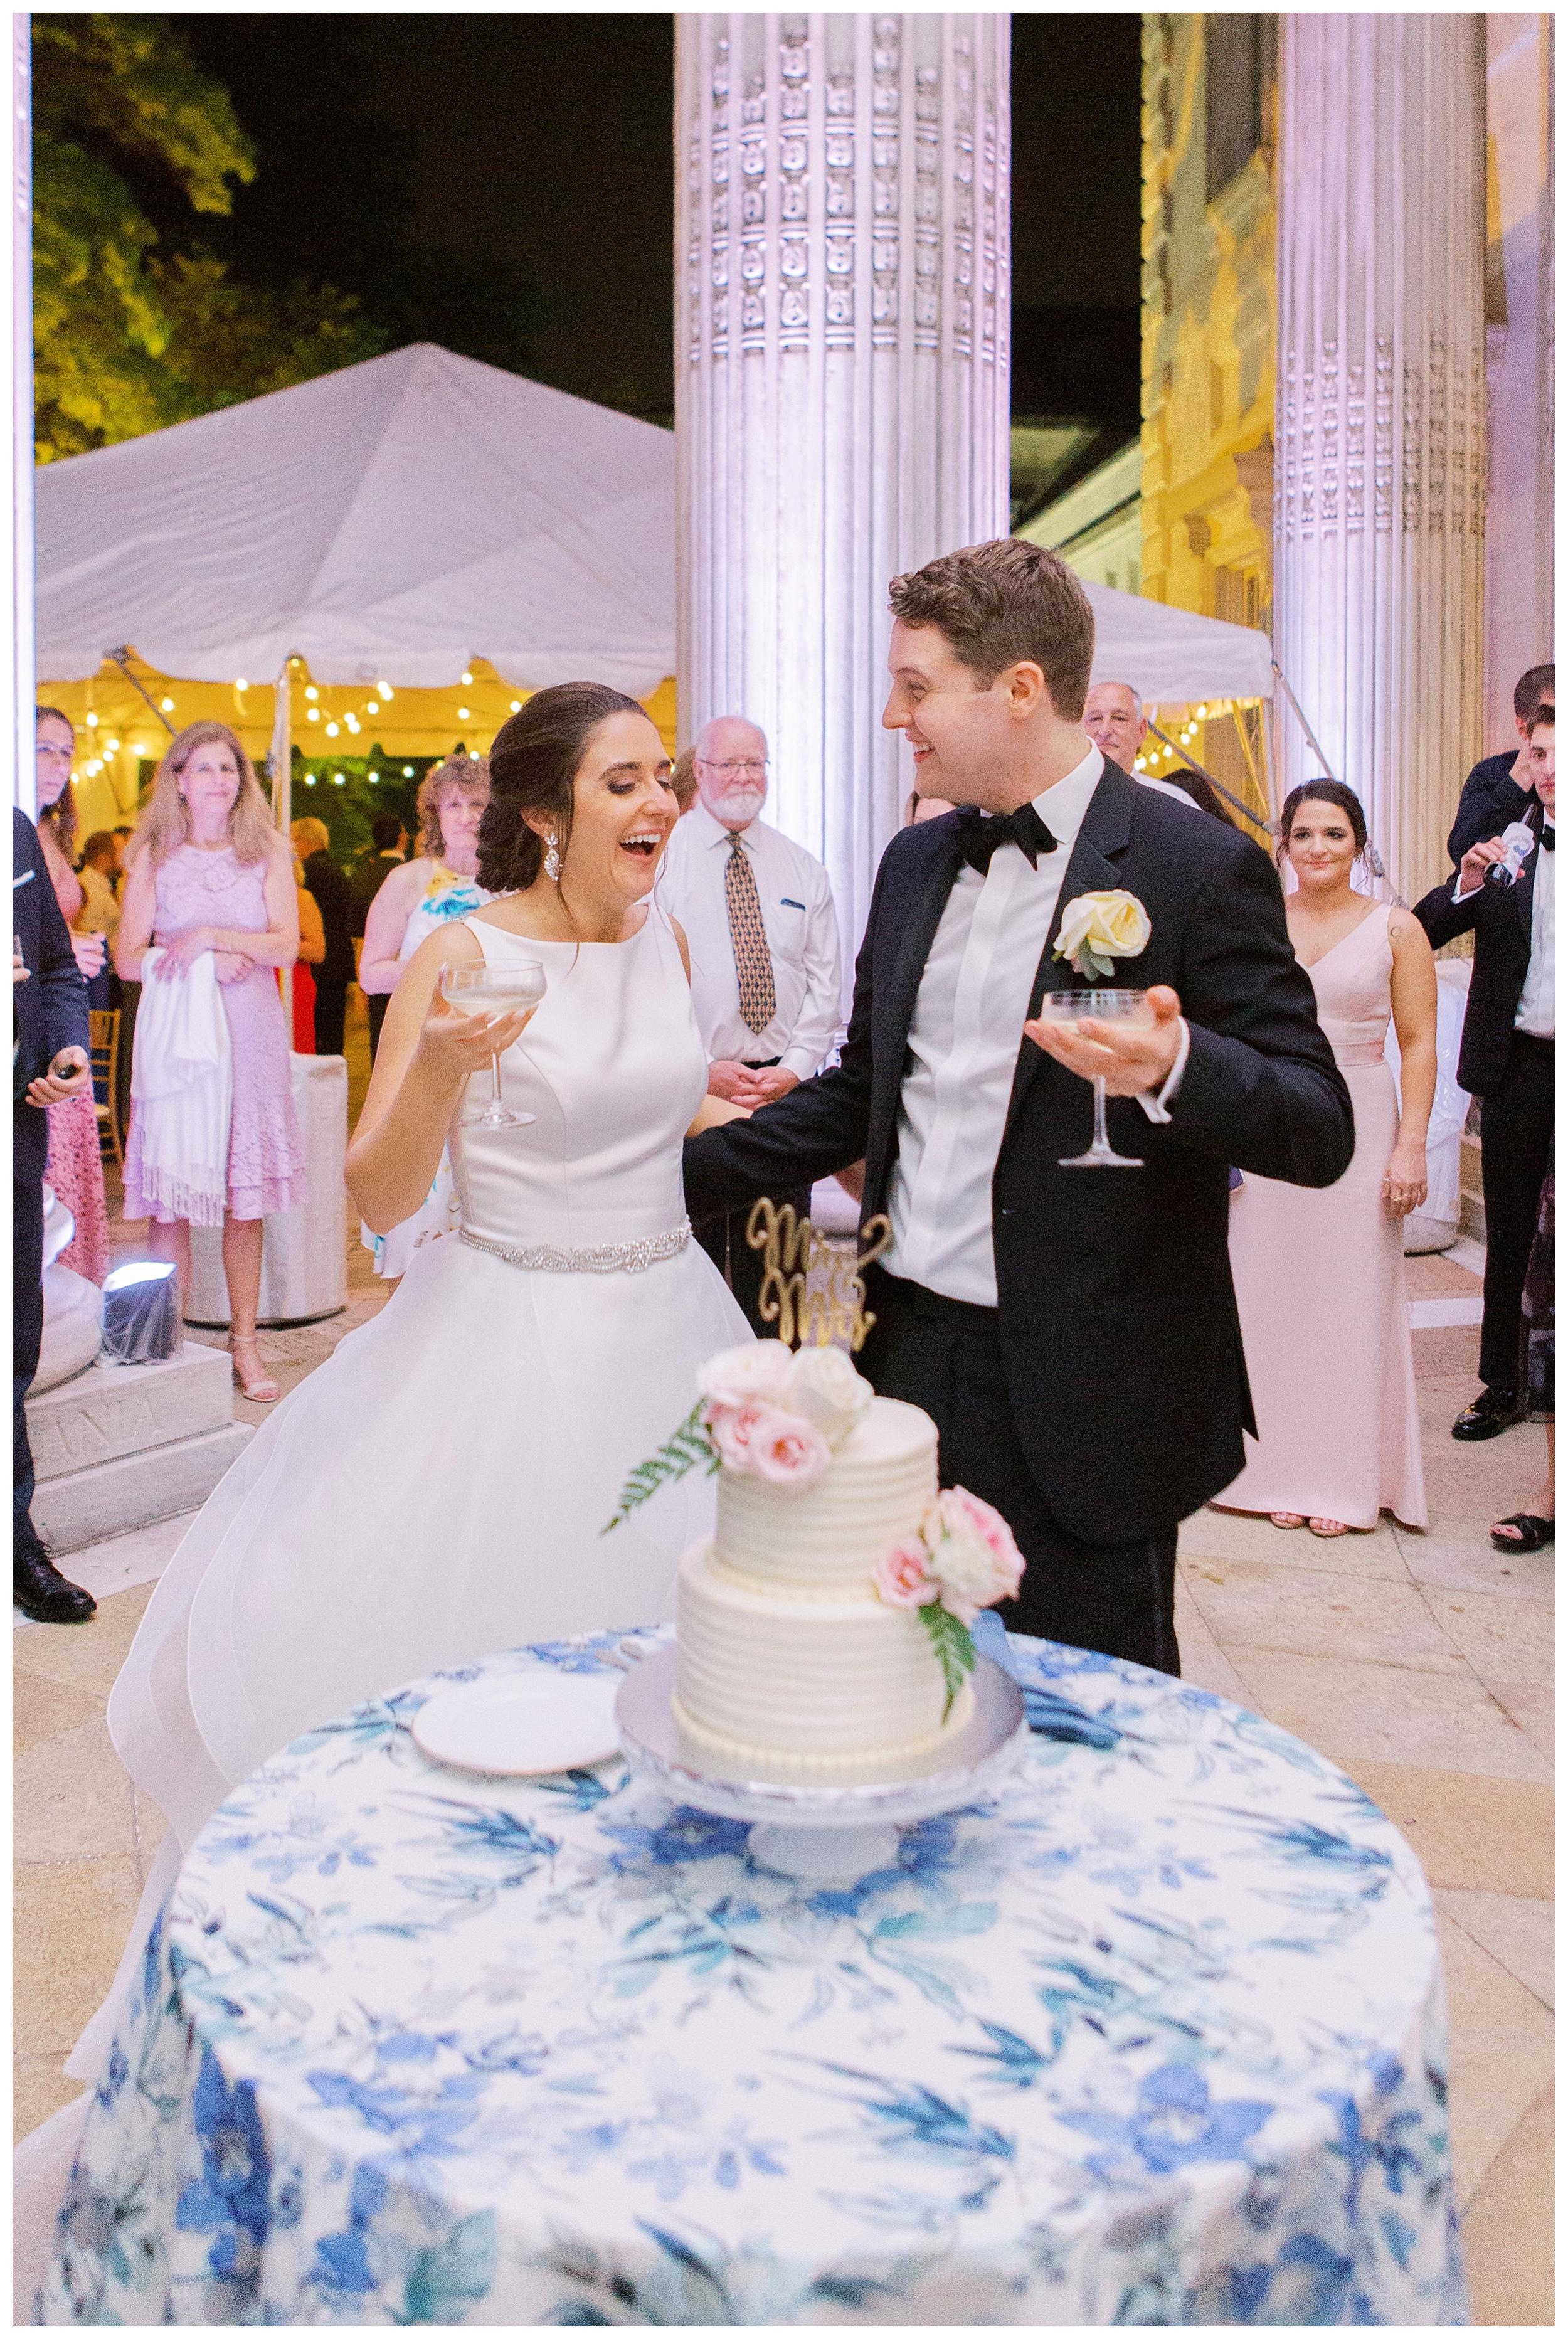 DAR Constitution Hall Wedding Wedding | Daughters of the American Revolution Wedding | District of Columbia Film Wedding Photographer Kir Tuben_0140.jpg